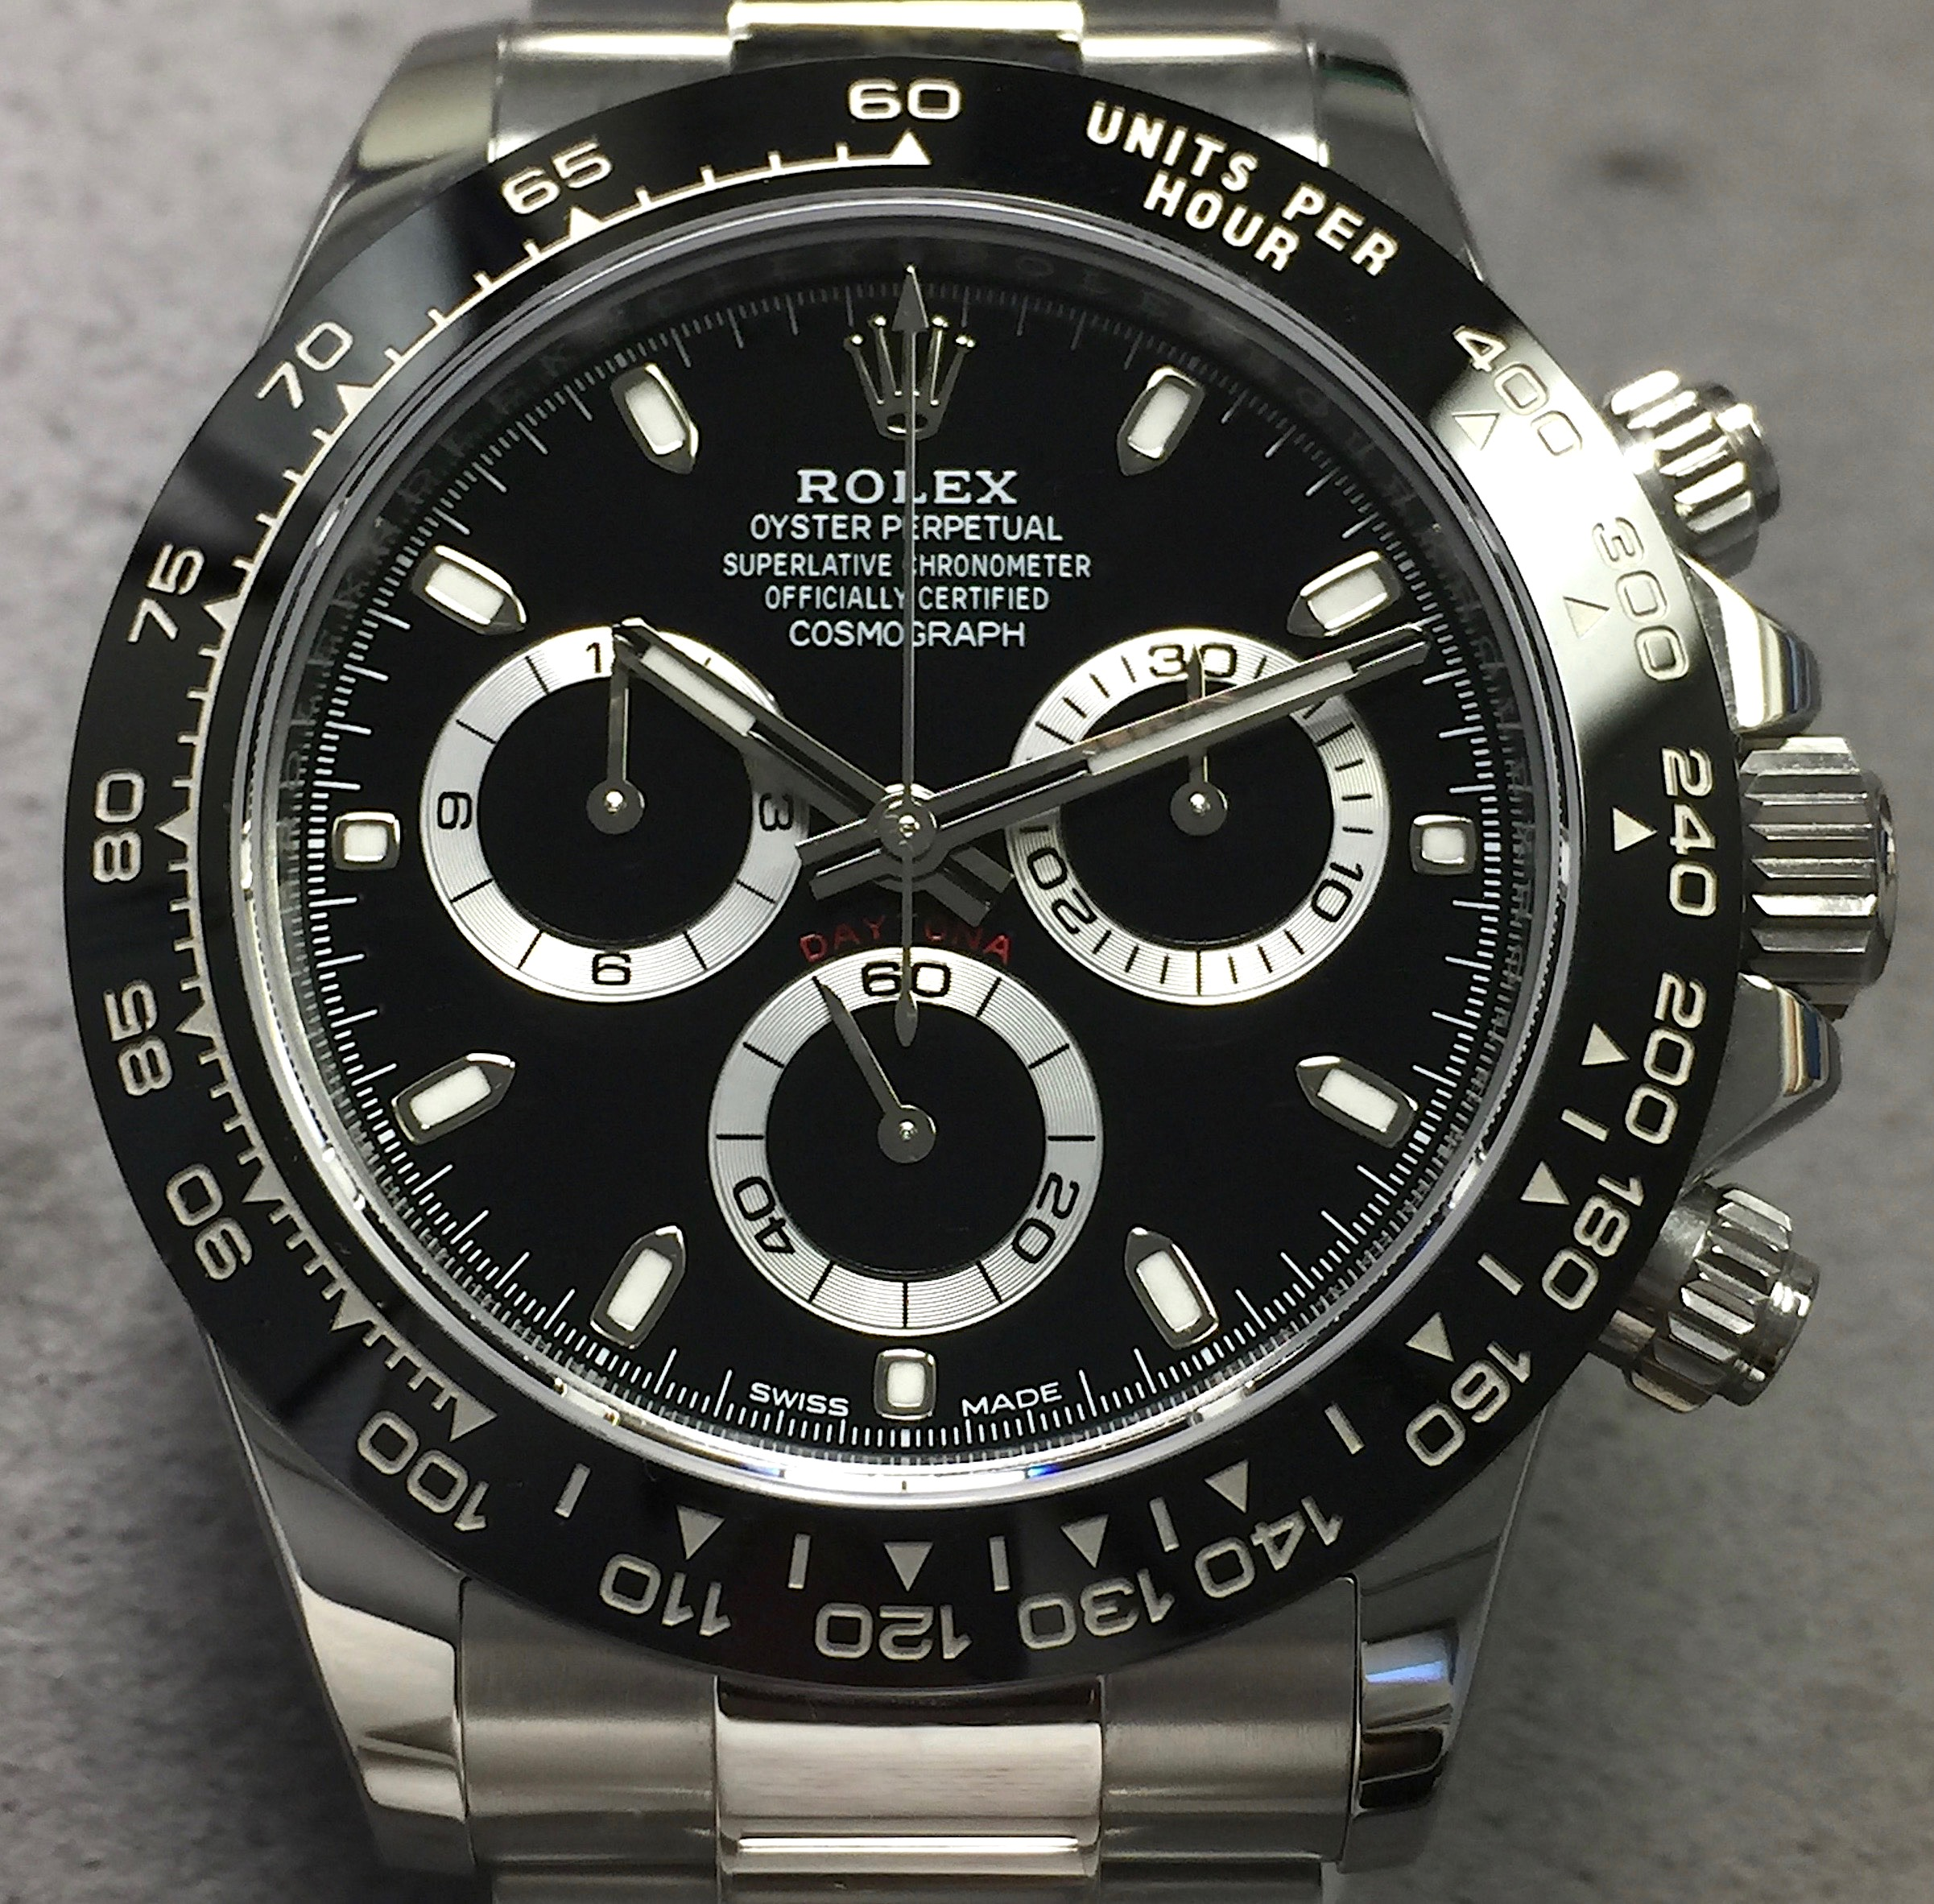 Rolex ceramic daytona cosmograph 116500 steel black dial oyster bracelet w card for Rolex cosmograph daytona